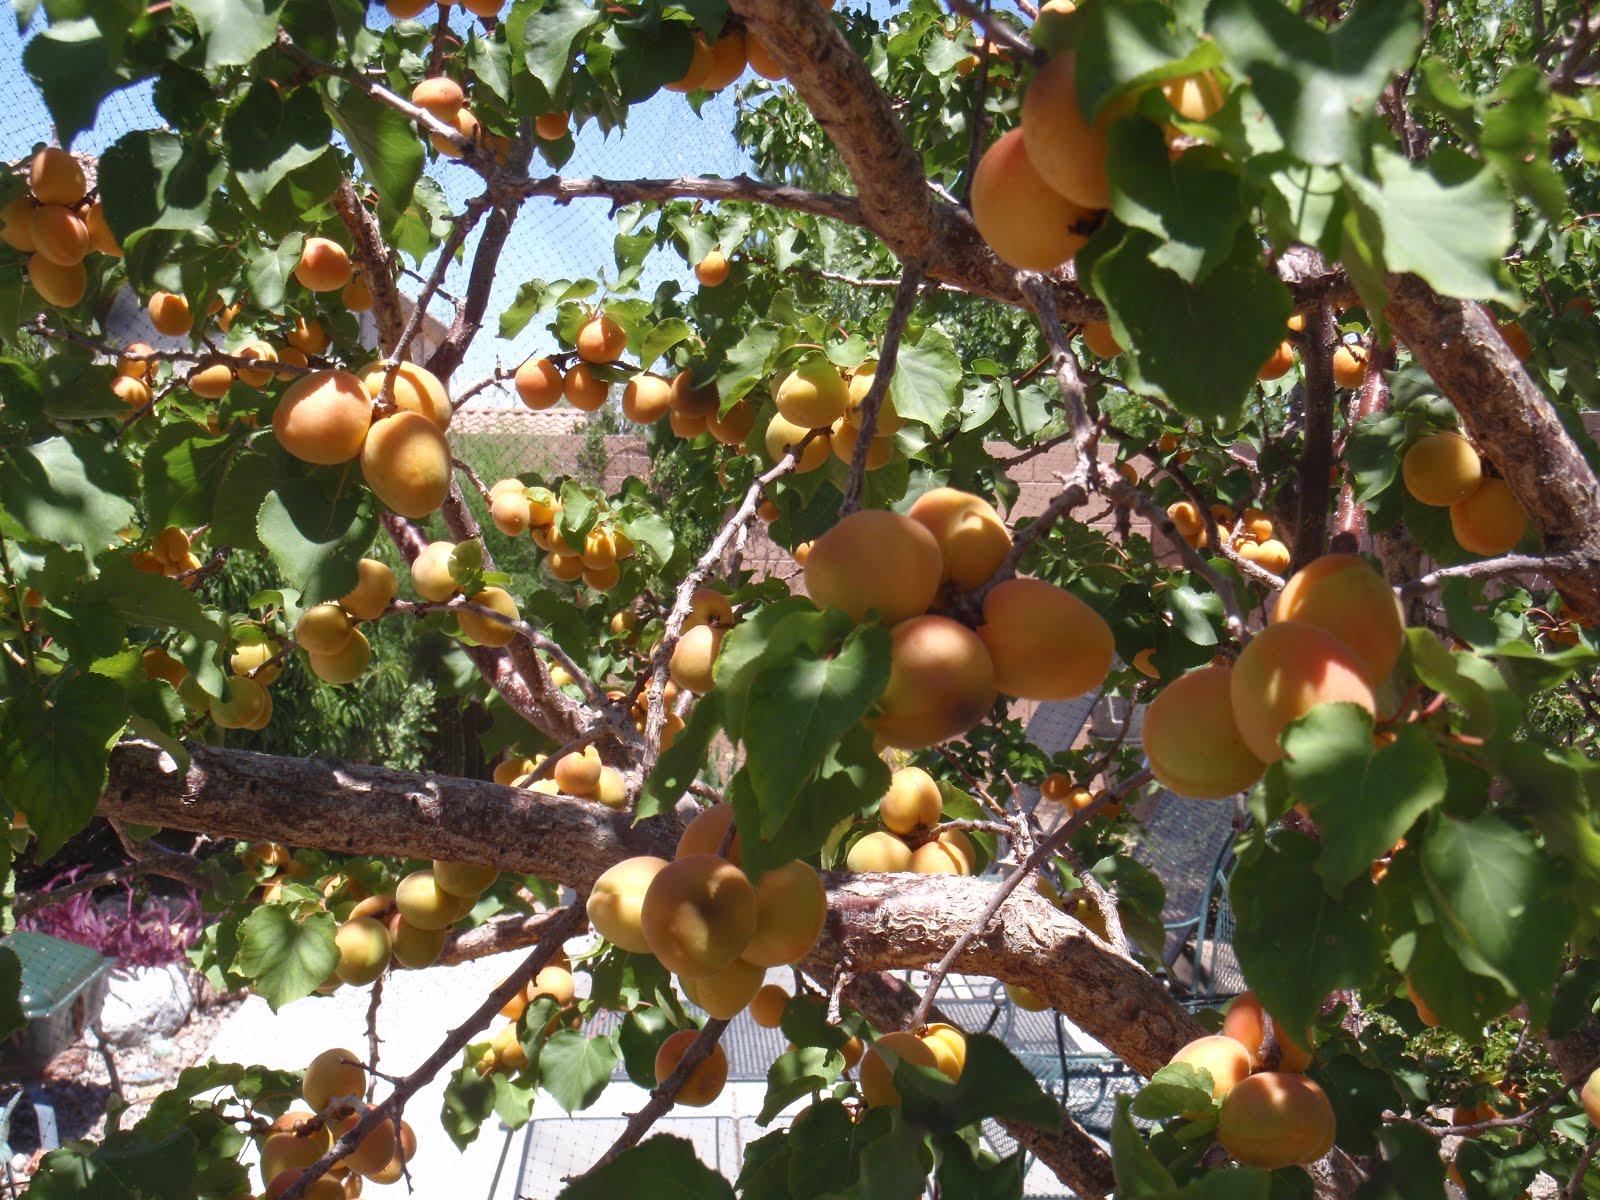 Fruit Trees Las Vegas: Netted Plum